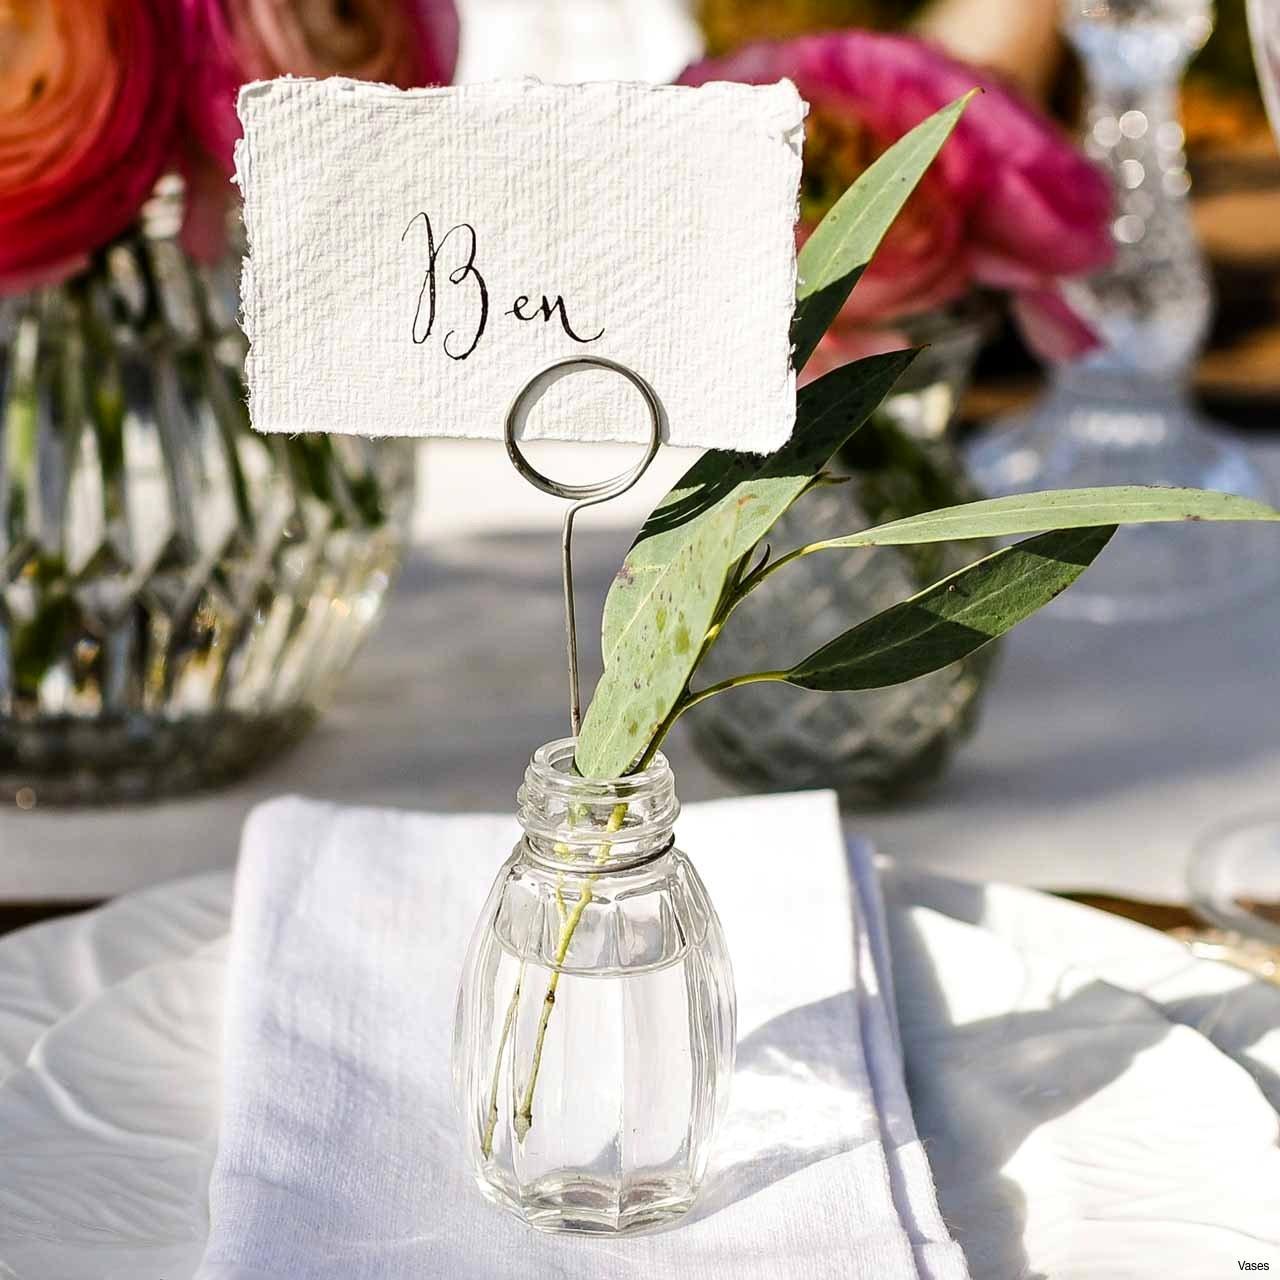 red bud vase of wedding place card holders inspirational jar flower 1h vases wedding regarding jar flower 1h vases wedding bud vase centerpiece idea i 0d bulk